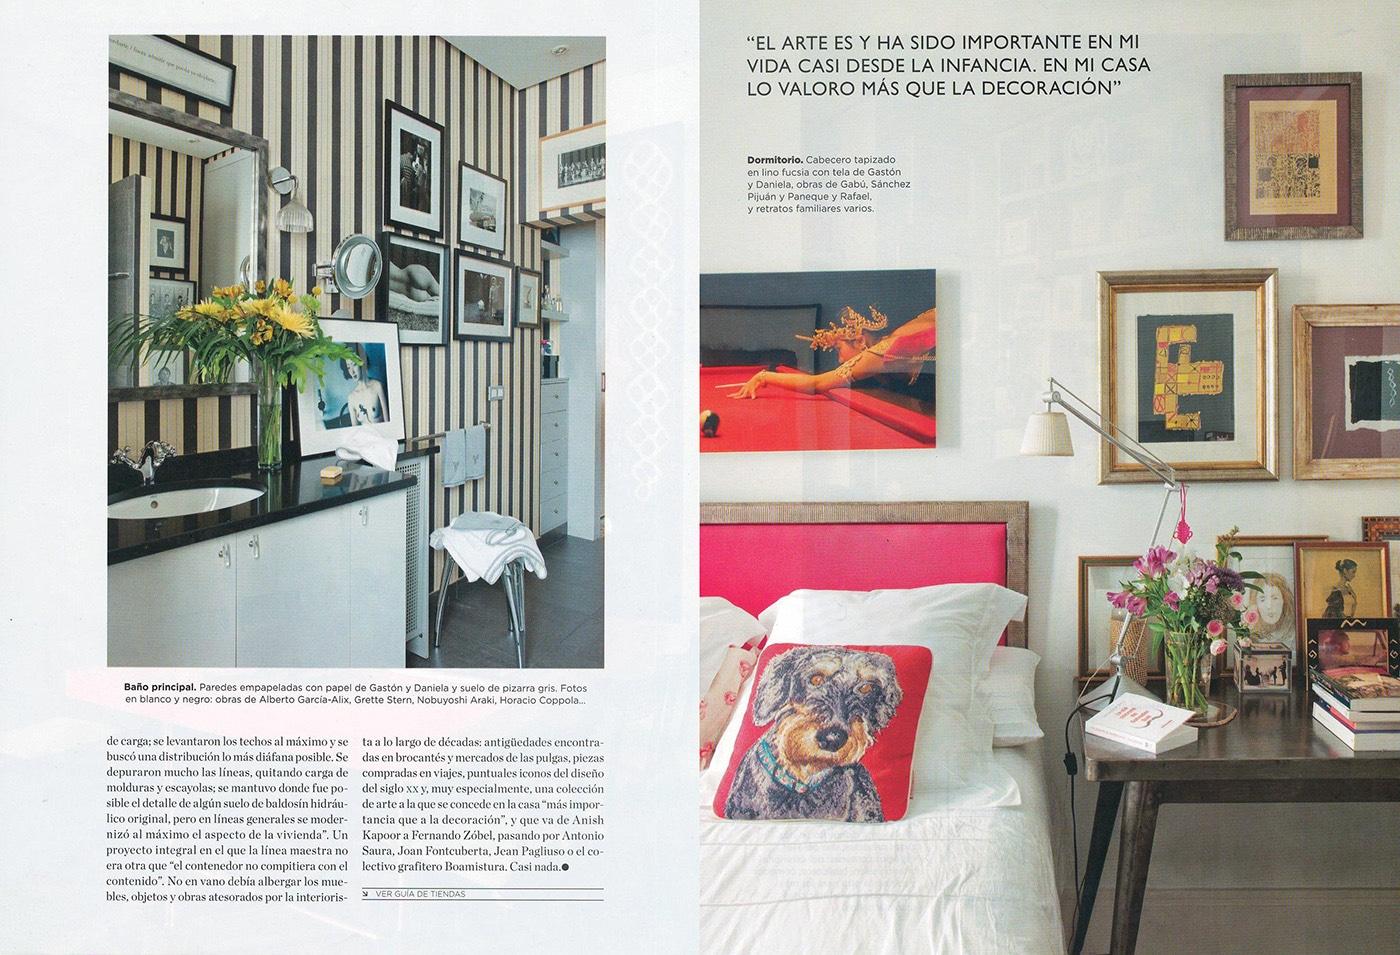 revista-interiores-mayo 2016-melian-randolph-6-casa-f